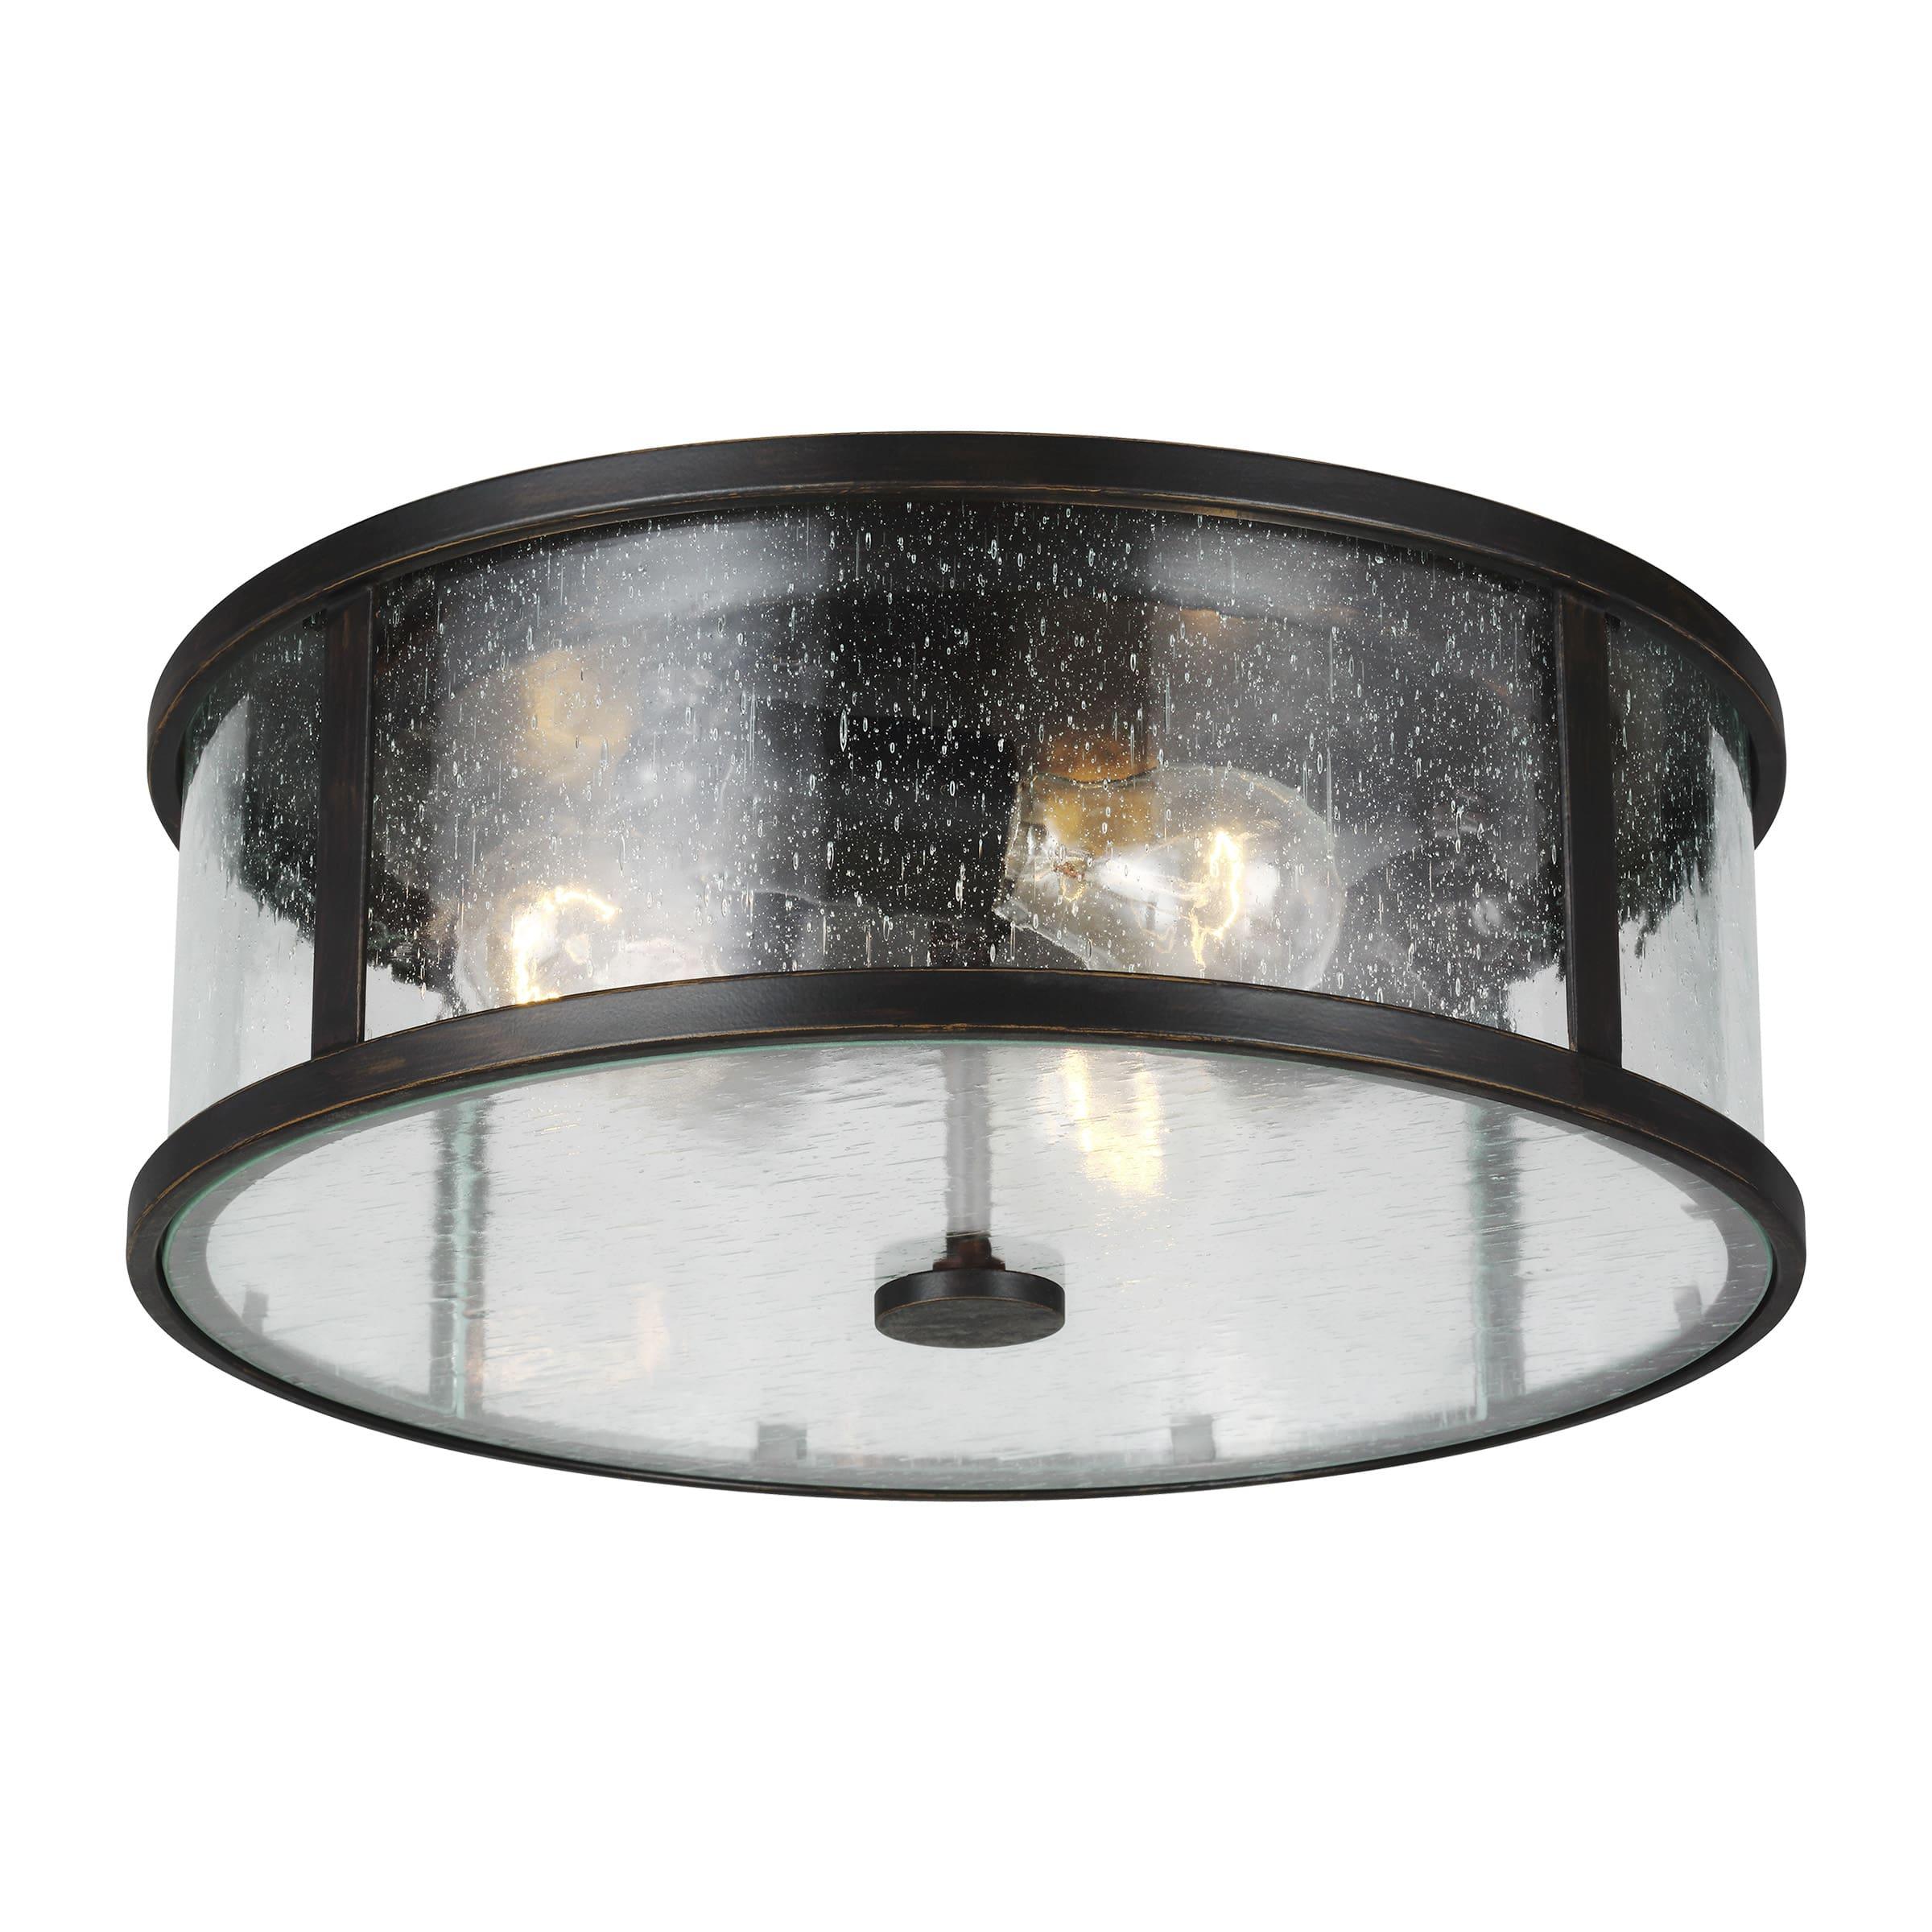 Feiss Ol7633es Espresso Dakota 3 Light 14 Wide Flush Mount Drum Ceiling Fixture With Clear Seeded Glass Shade Lightingdirect Com